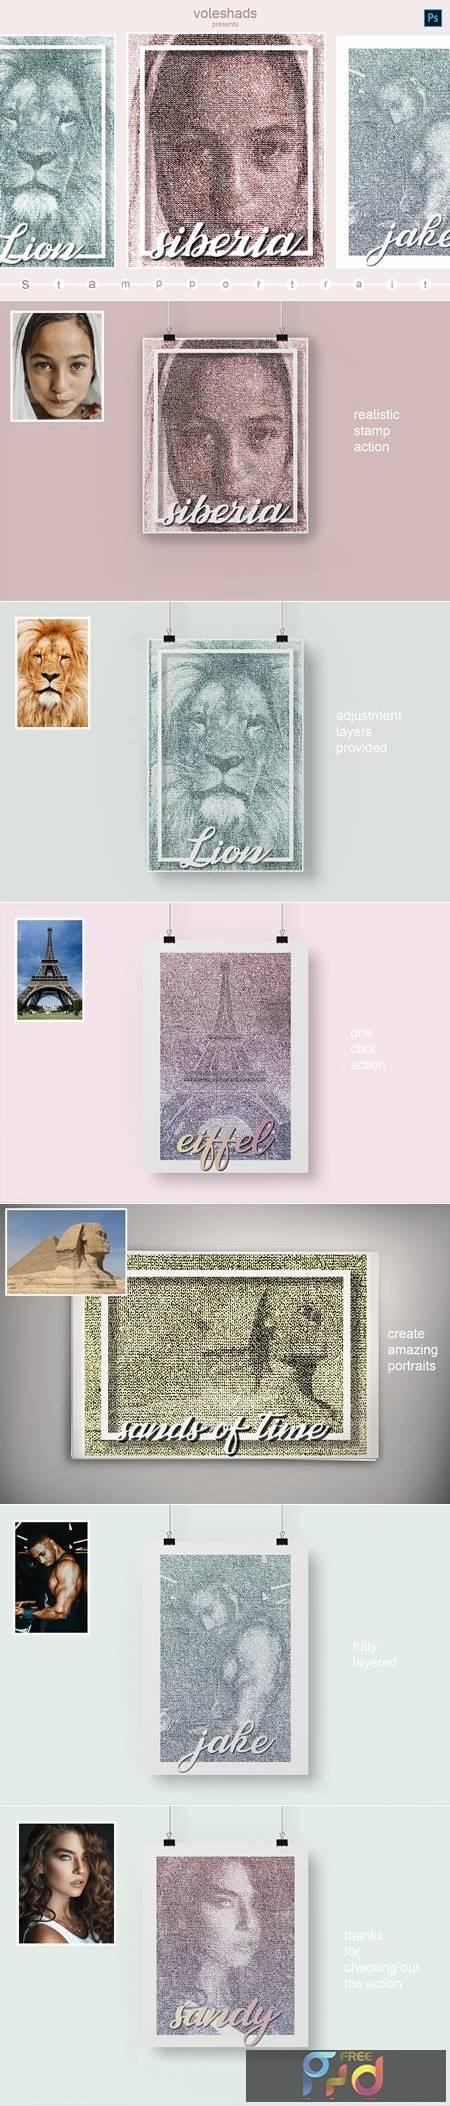 Stamp portrait Photoshop Action 5933908 1